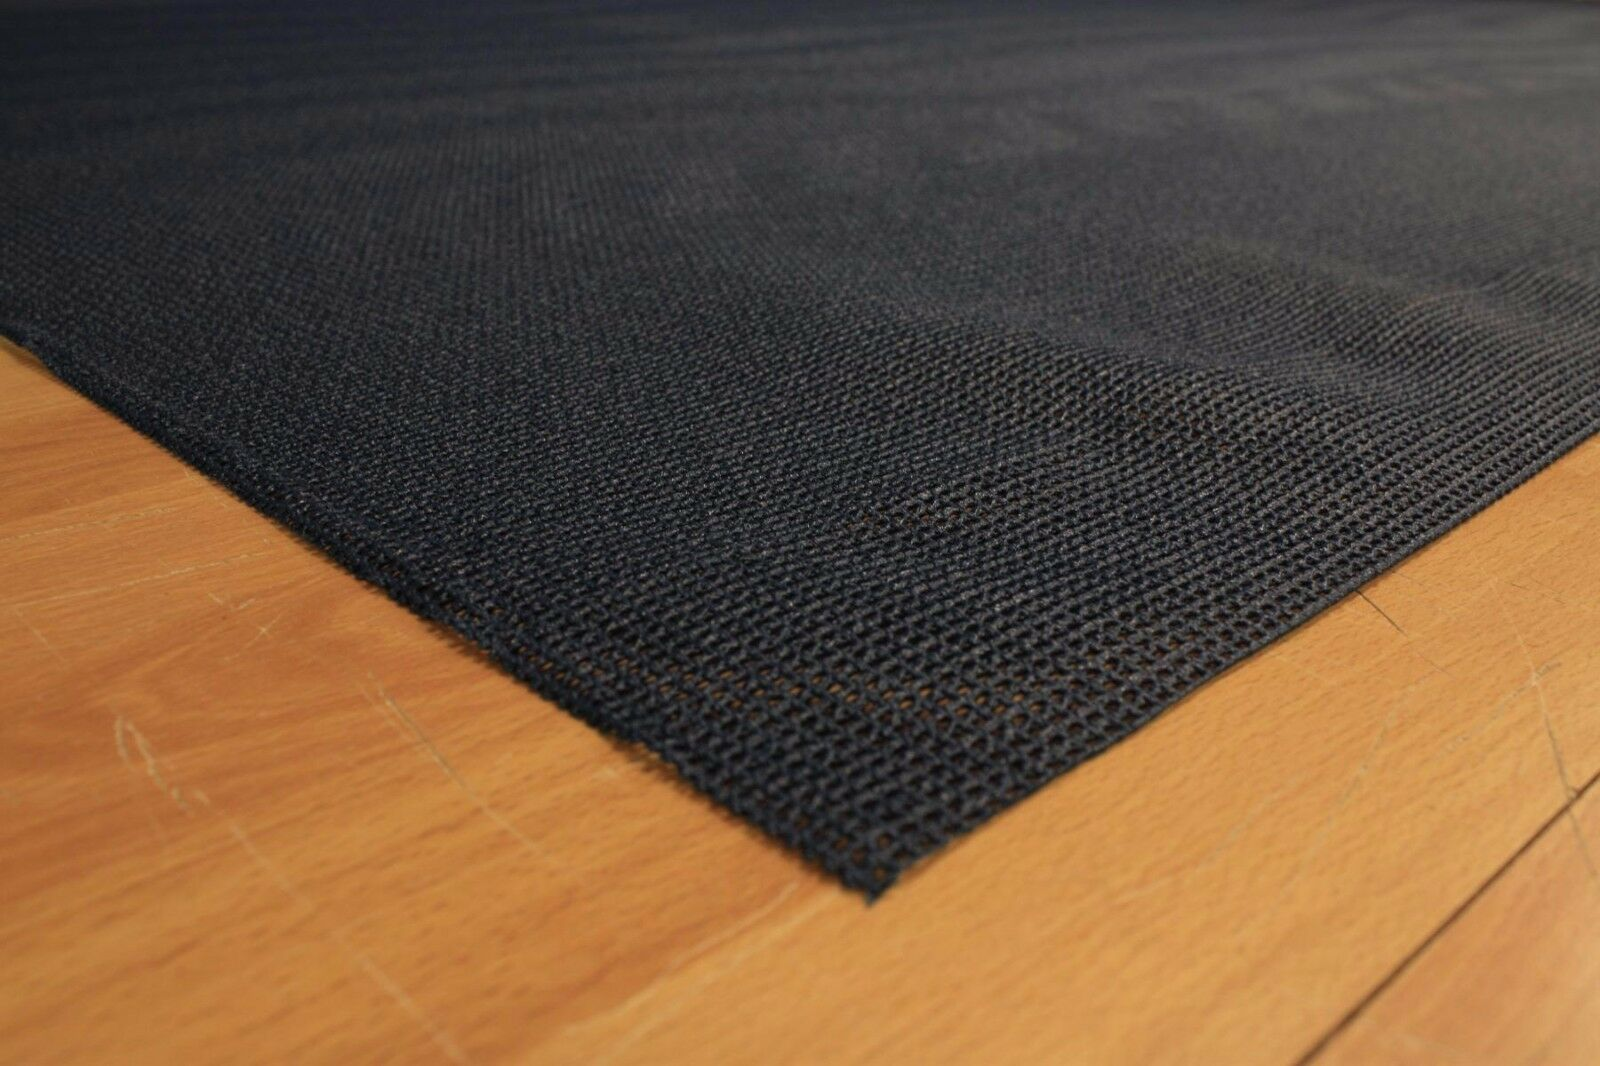 Zeltteppich Campingteppich Vorzeltteppich Blau 250 x 300 in cm Made in 300 Germany bda2a1